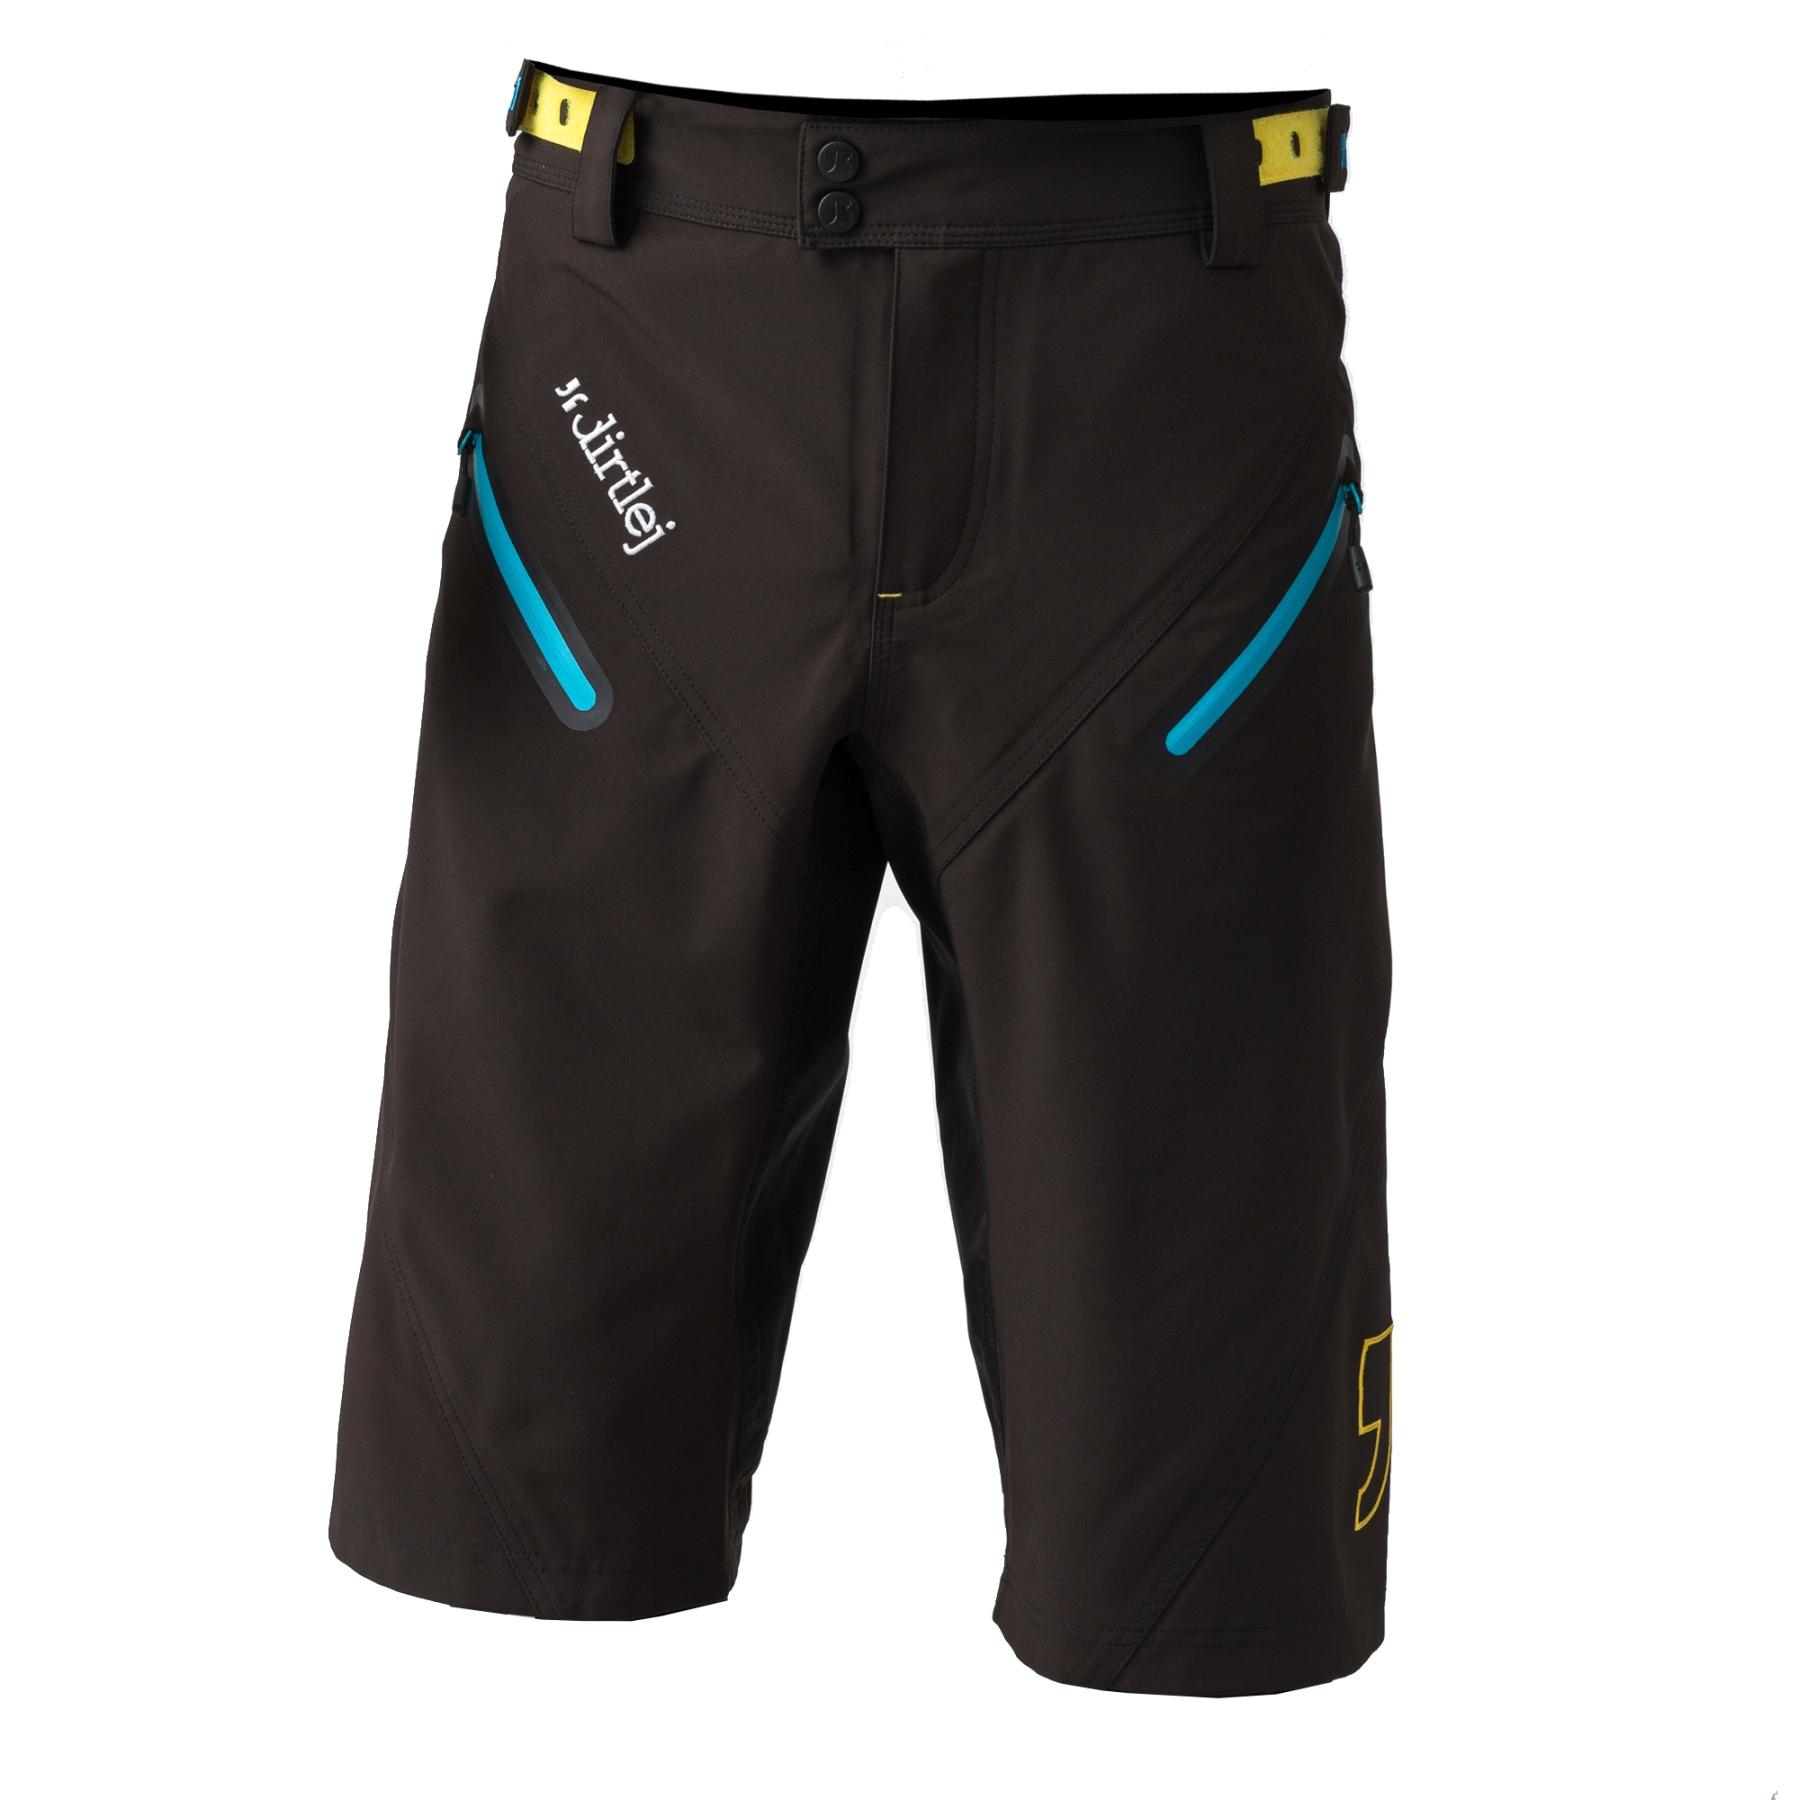 Foto de Dirtlej Trailscout Waterproof Pantalones para Hombres - black/blue